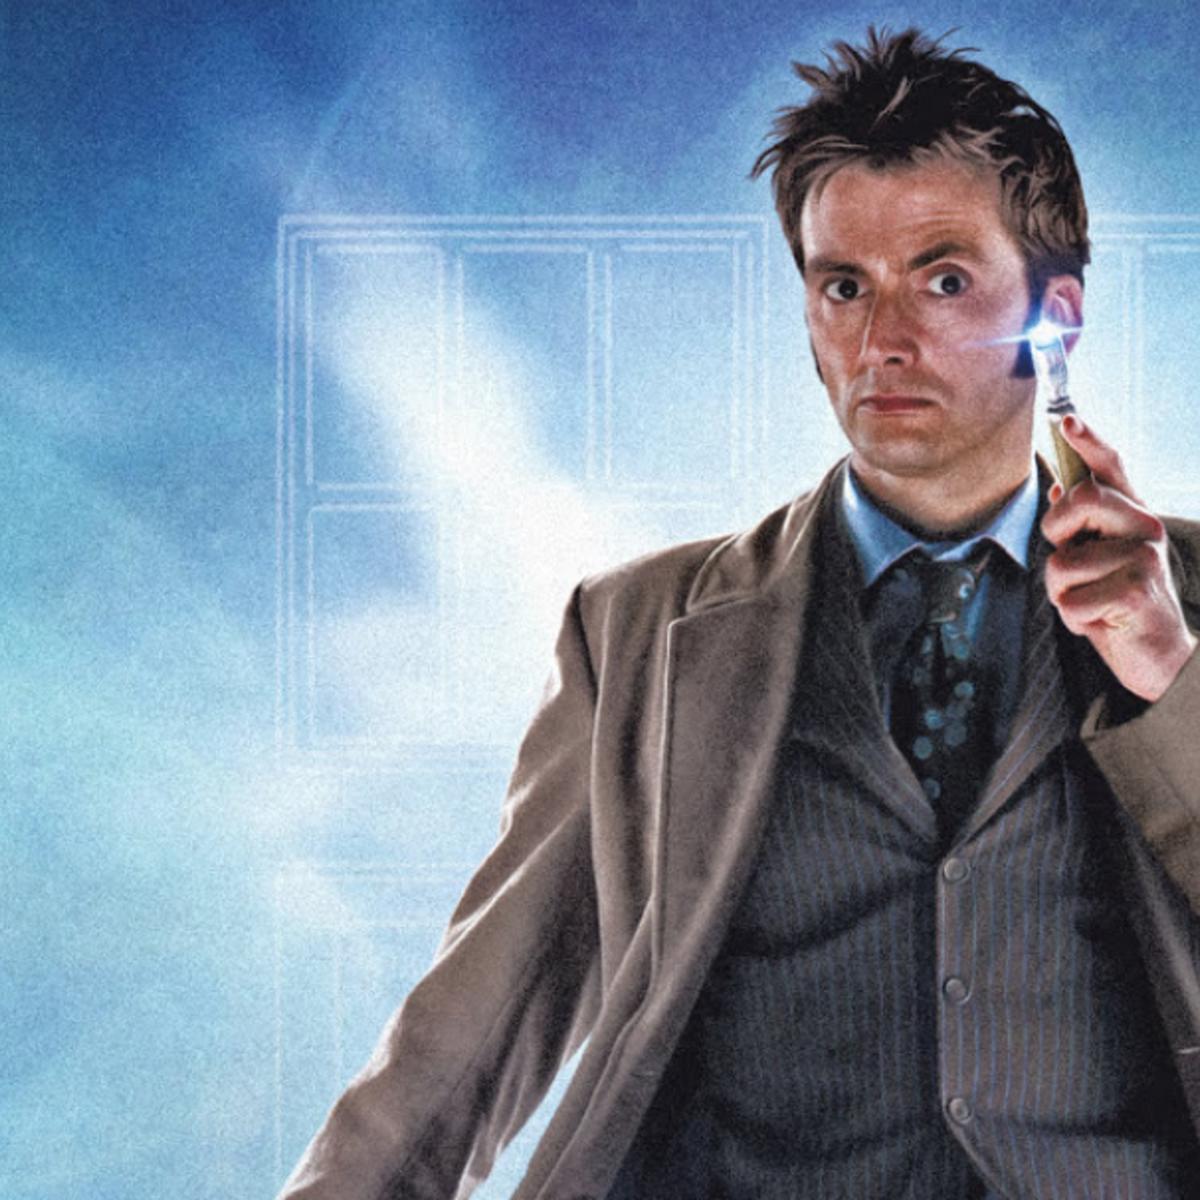 10th doctor slice